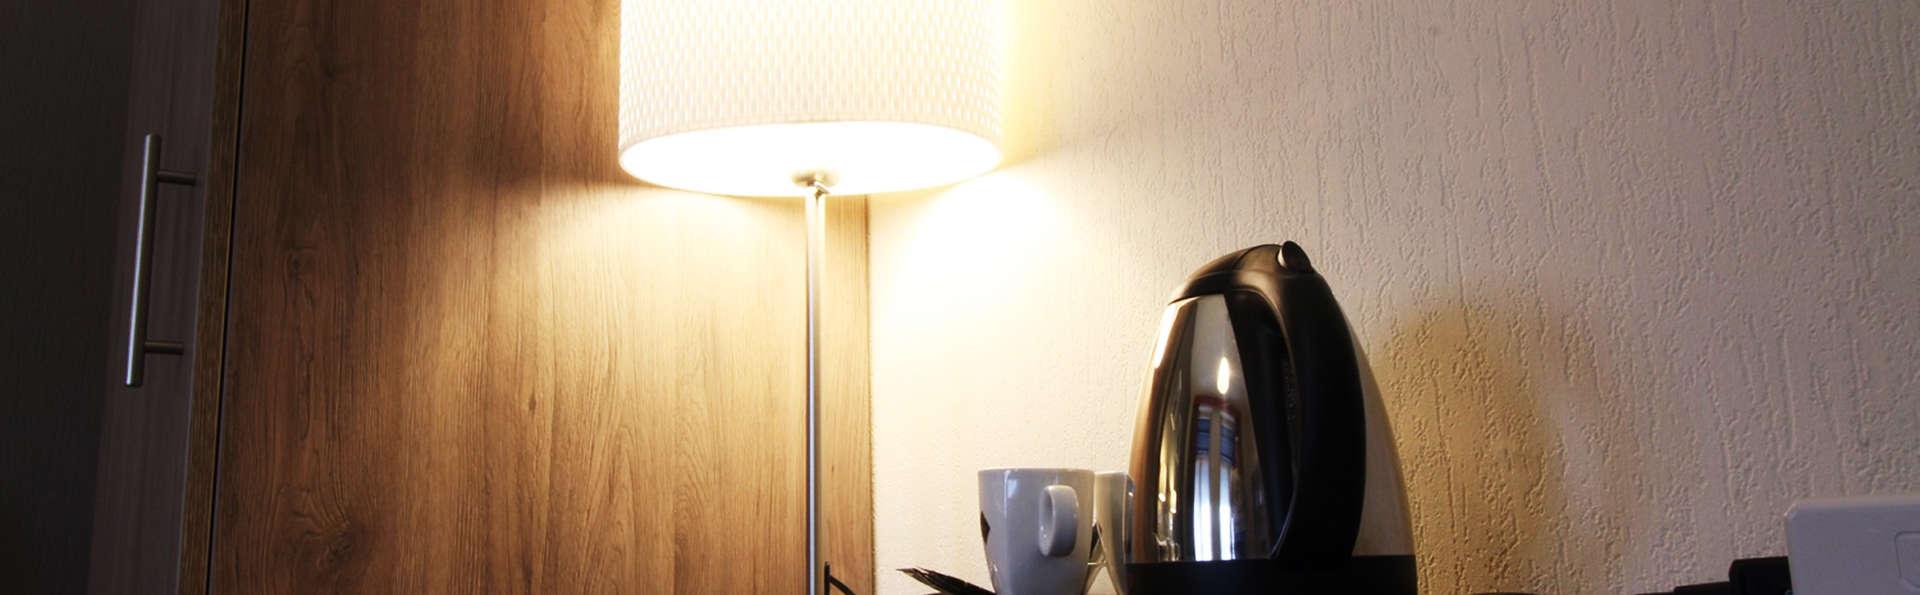 Hotel Hulsman - EDIT_detailroom.jpg